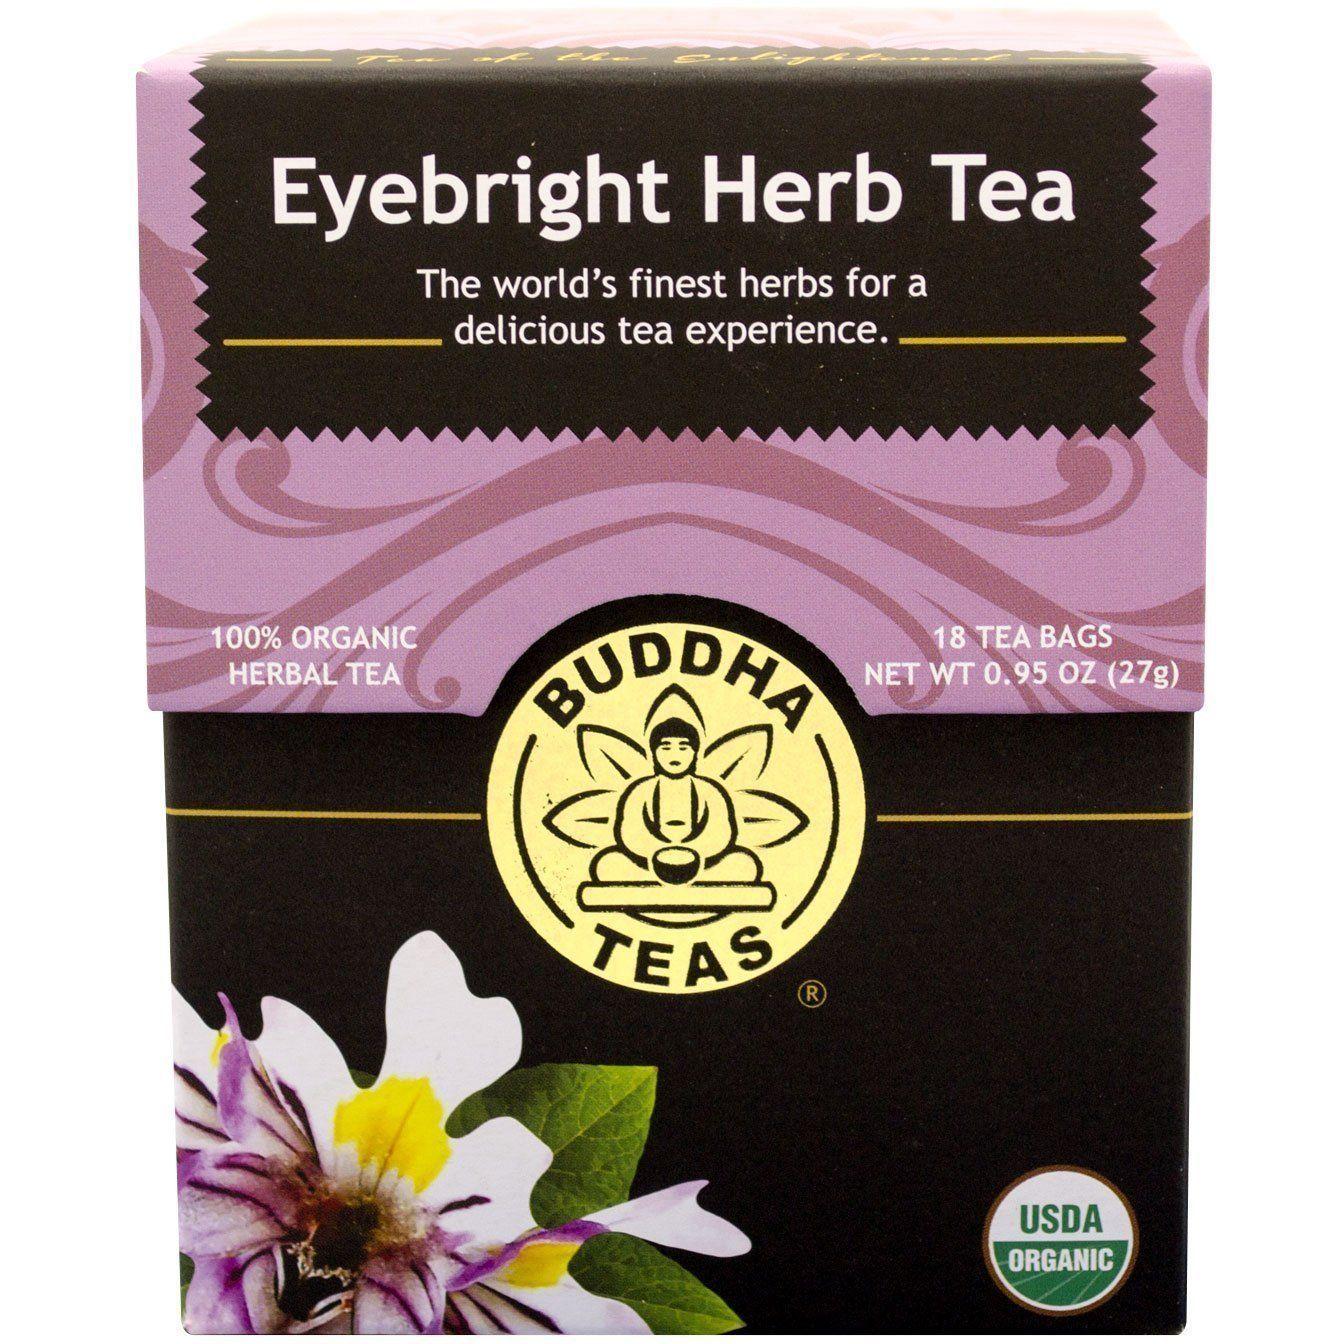 Buddha Teas Eyebright Herb Tea Organic Herbal Tea